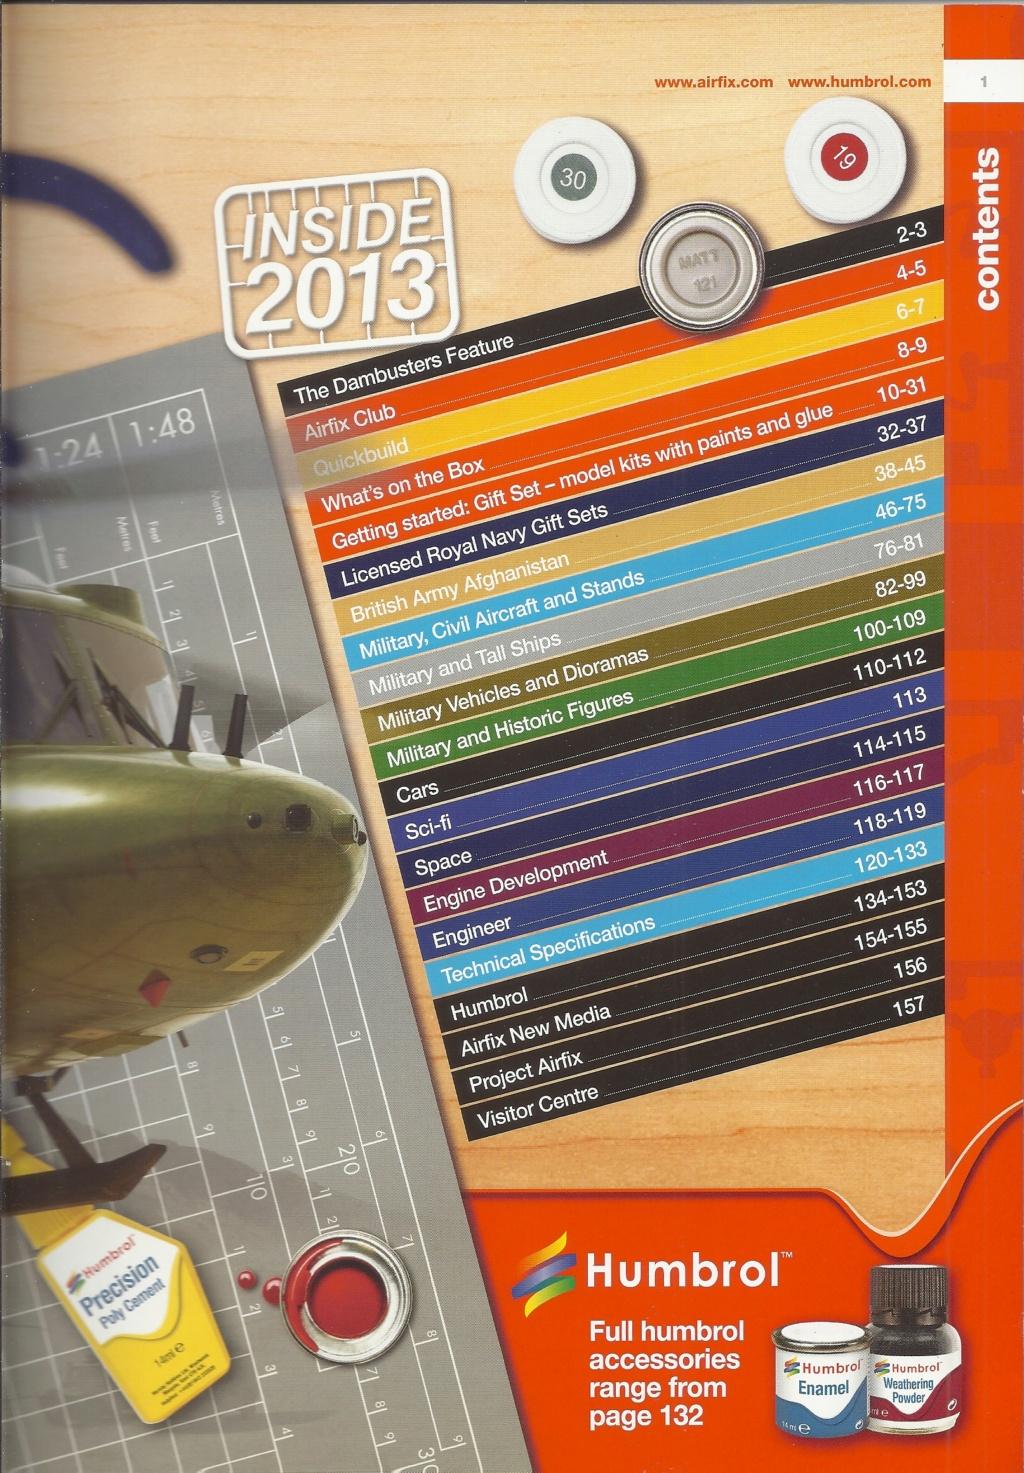 [AIRFIX 2013] Catalogue 2013 Airf1400